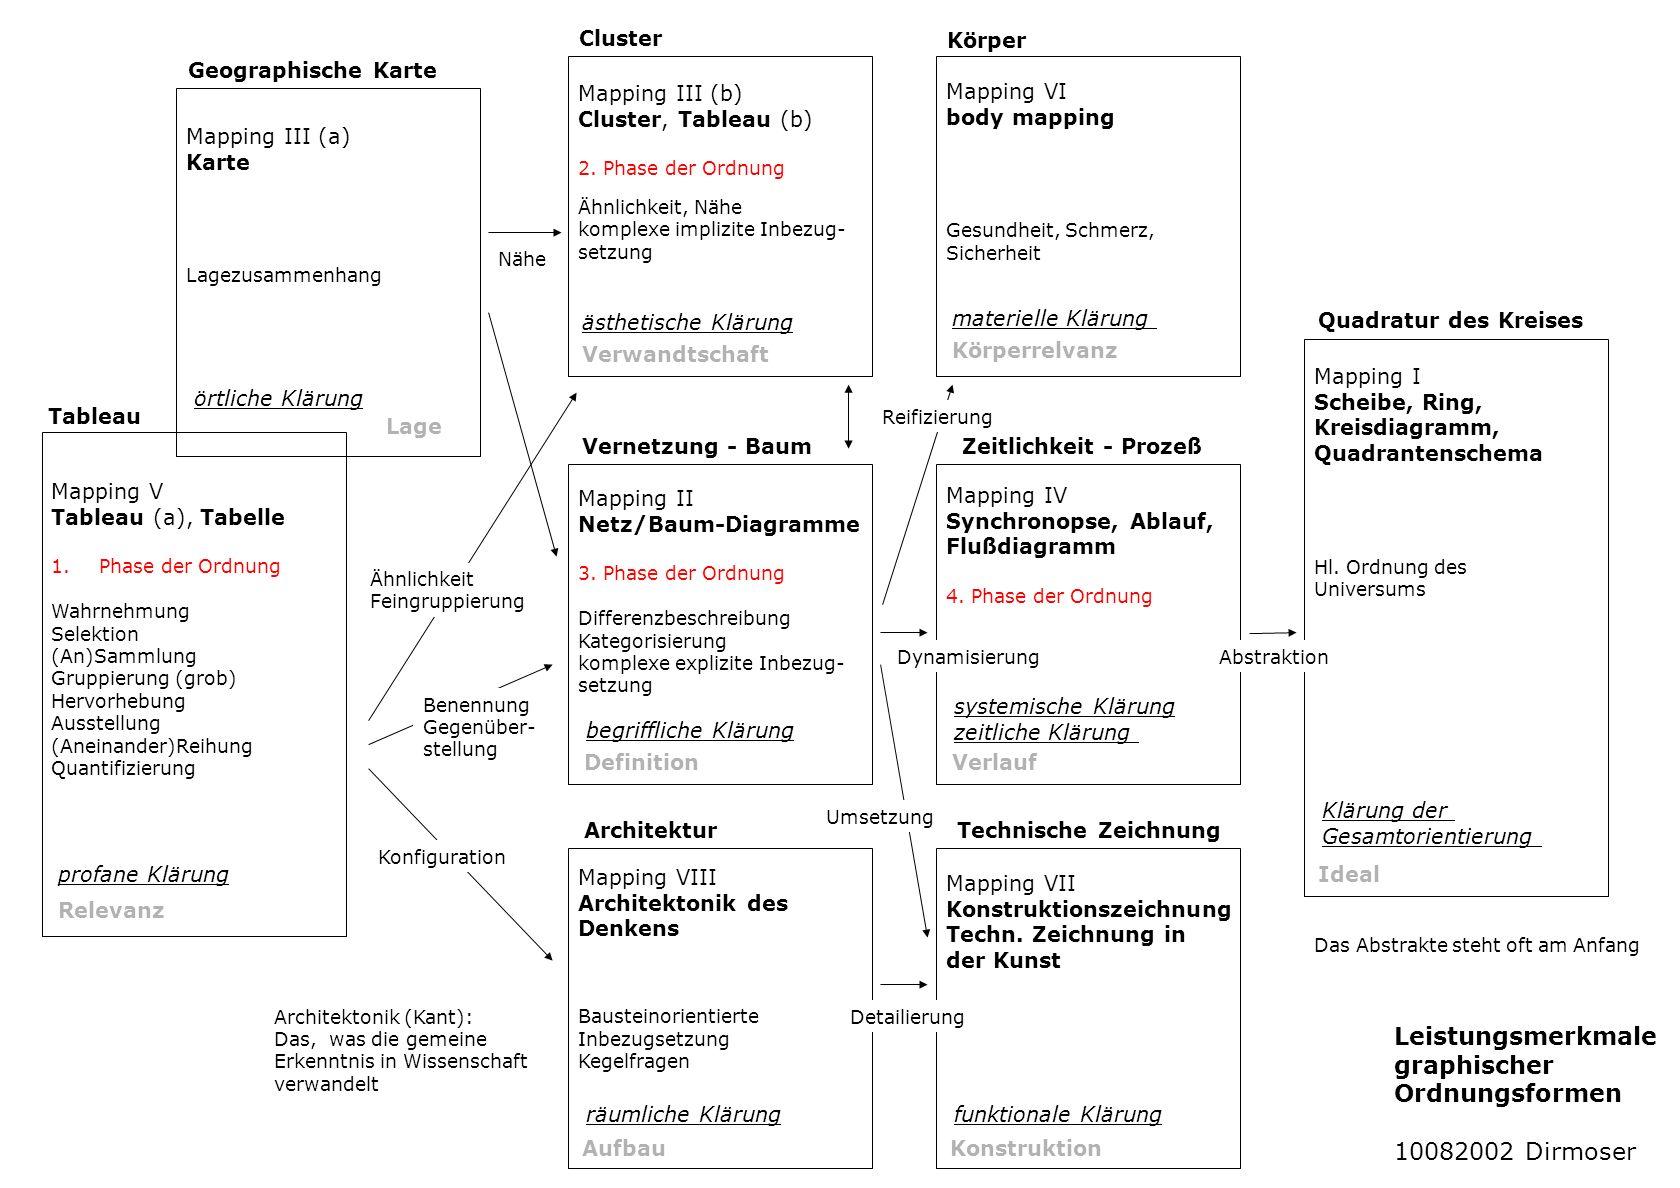 Mapping V Tableau (a), Tabelle 1.Phase der Ordnung Wahrnehmung Selektion (An)Sammlung Gruppierung (grob) Hervorhebung Ausstellung (Aneinander)Reihung